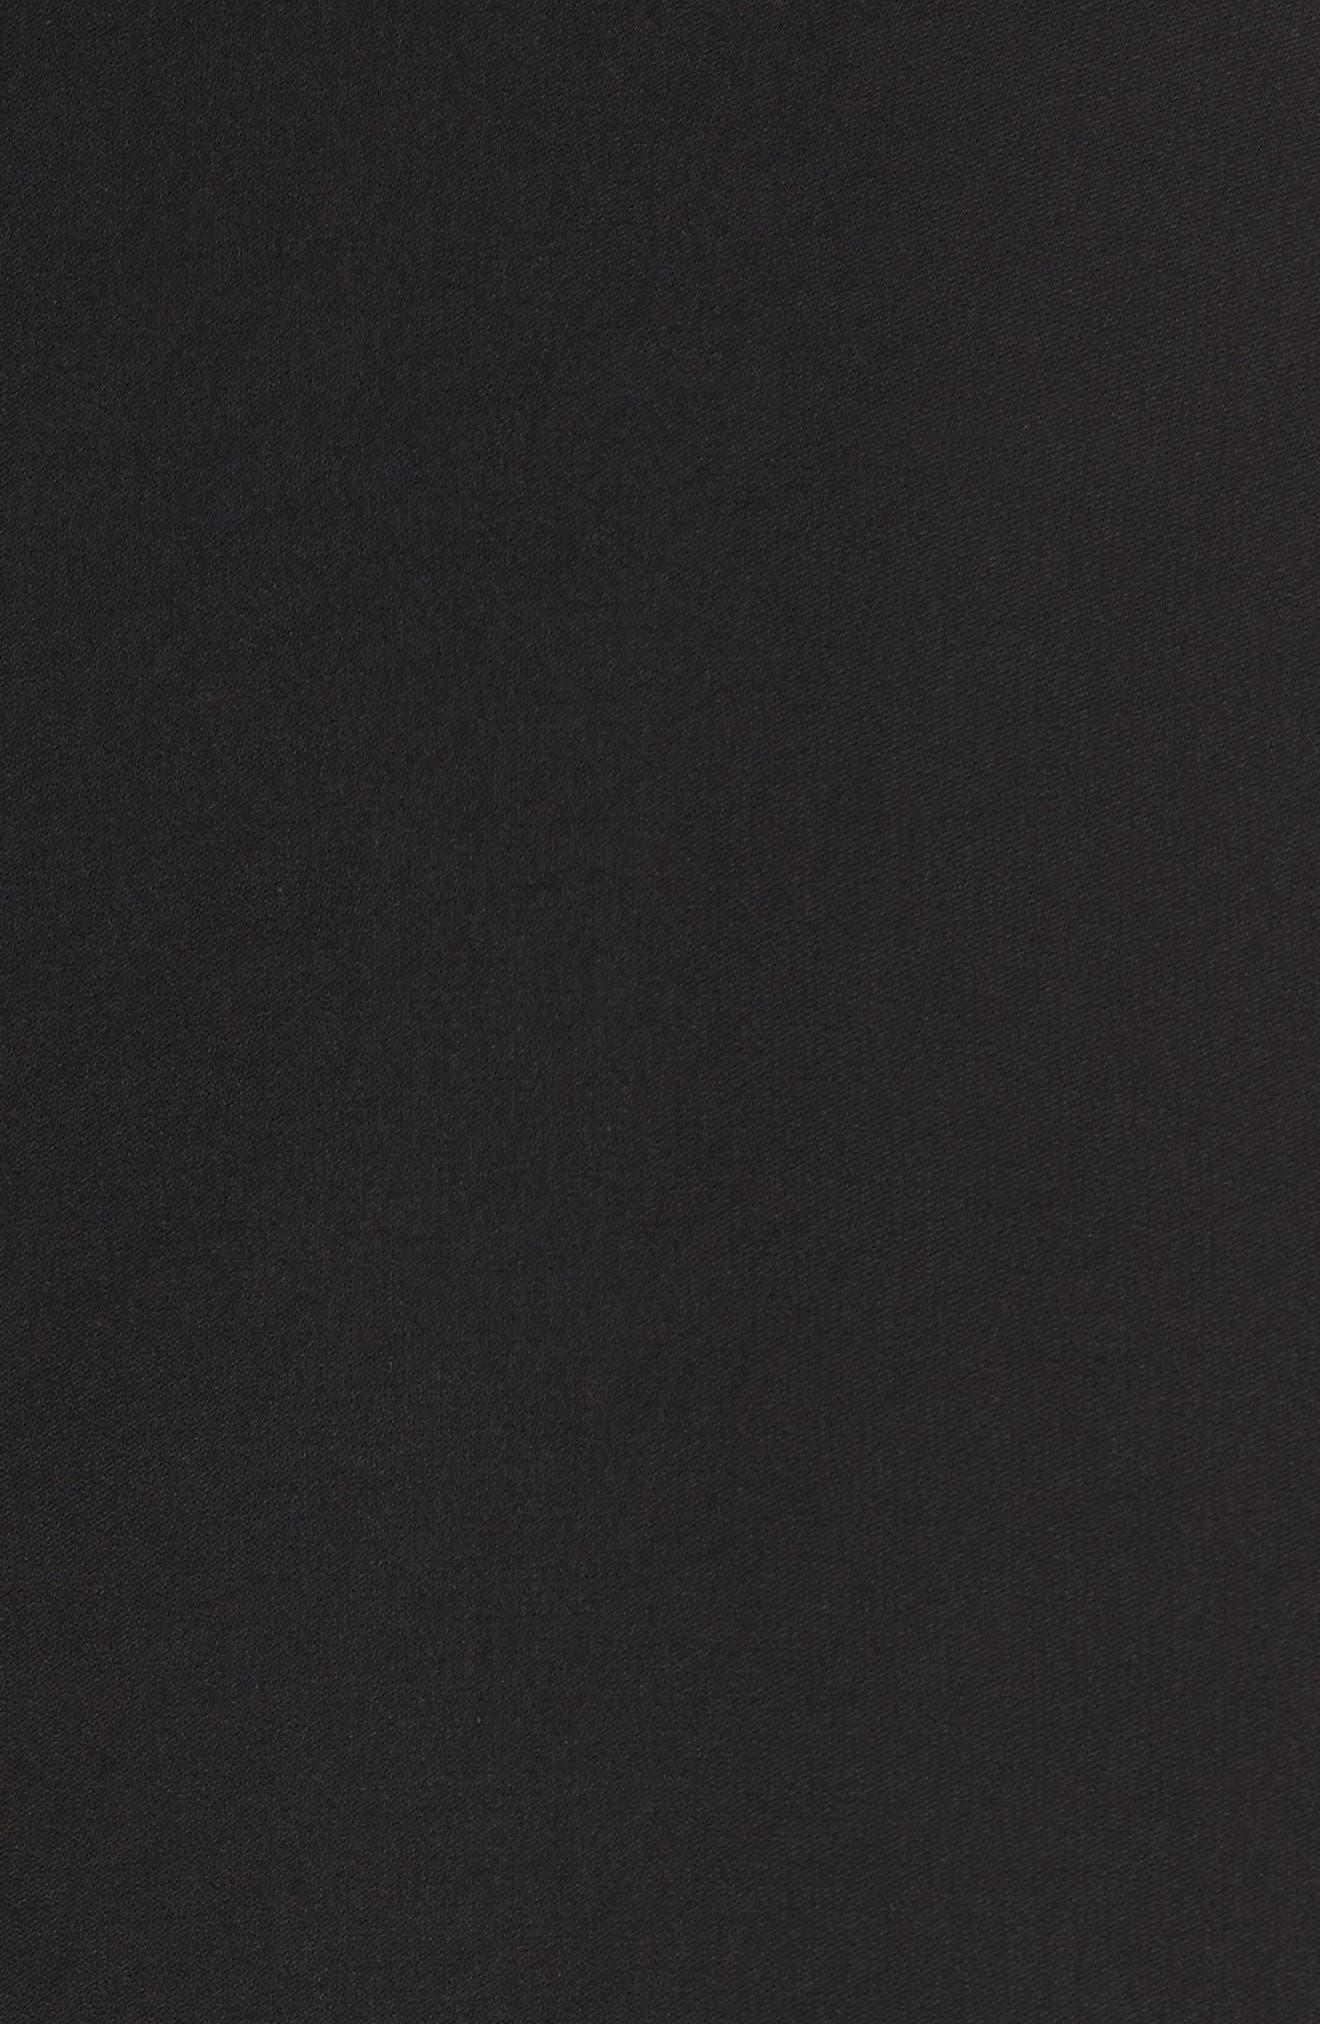 Roll Sleeve Tee,                             Alternate thumbnail 5, color,                             Black/ White